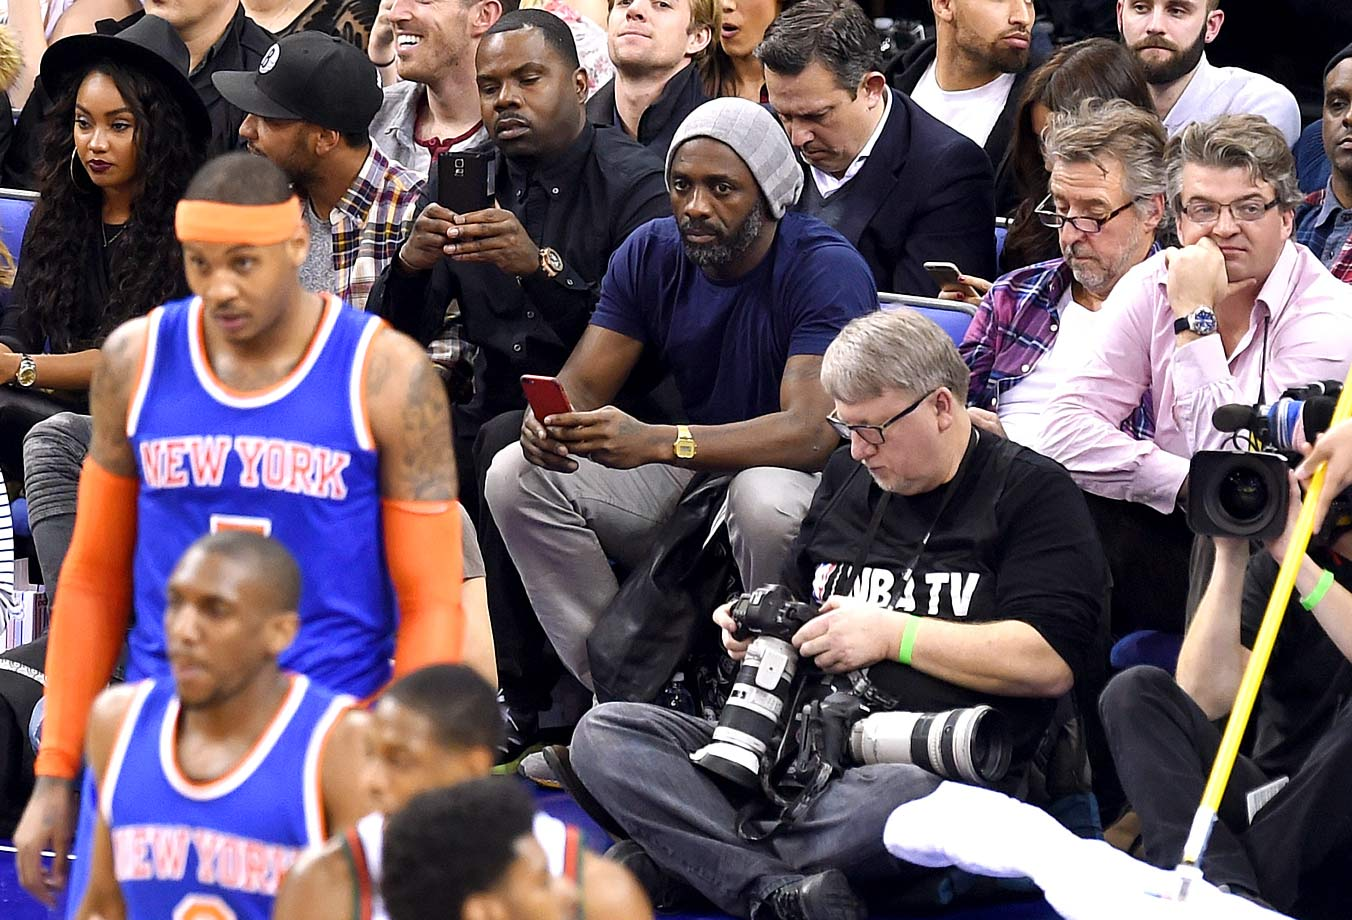 Jan. 15, 2015: New York Knicks vs. Milwaukee Bucks at 02 Arena in London